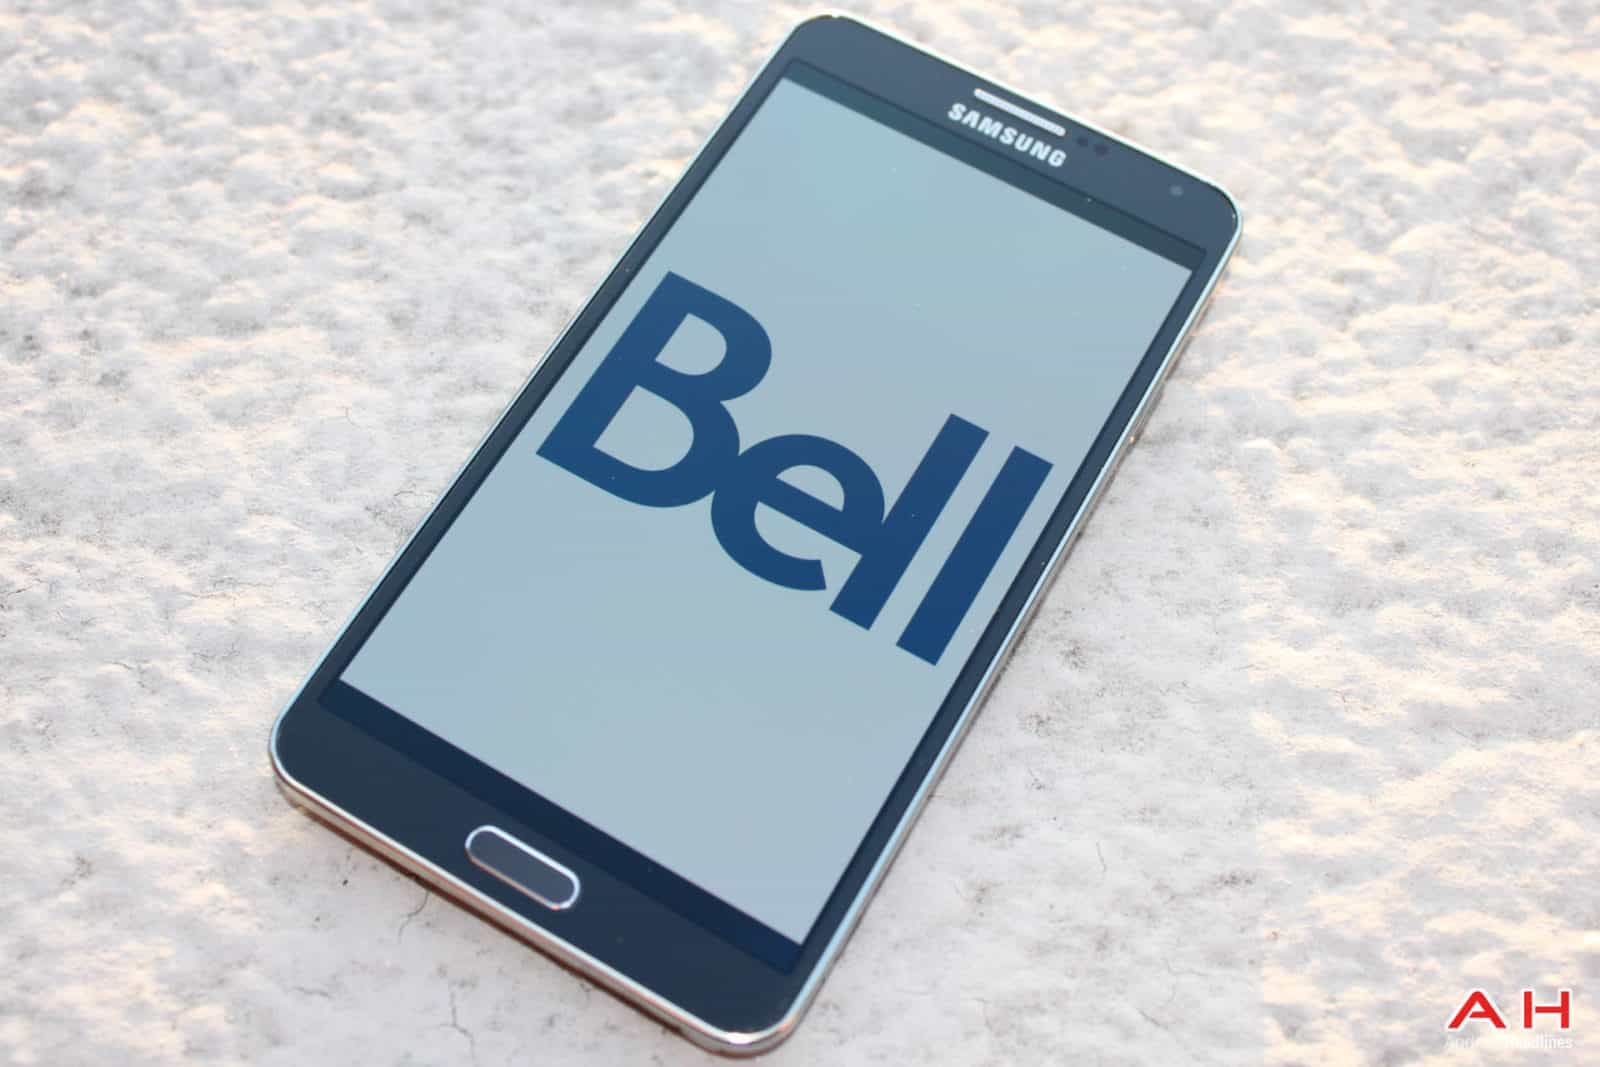 AH Bell Canada Logo 1.5